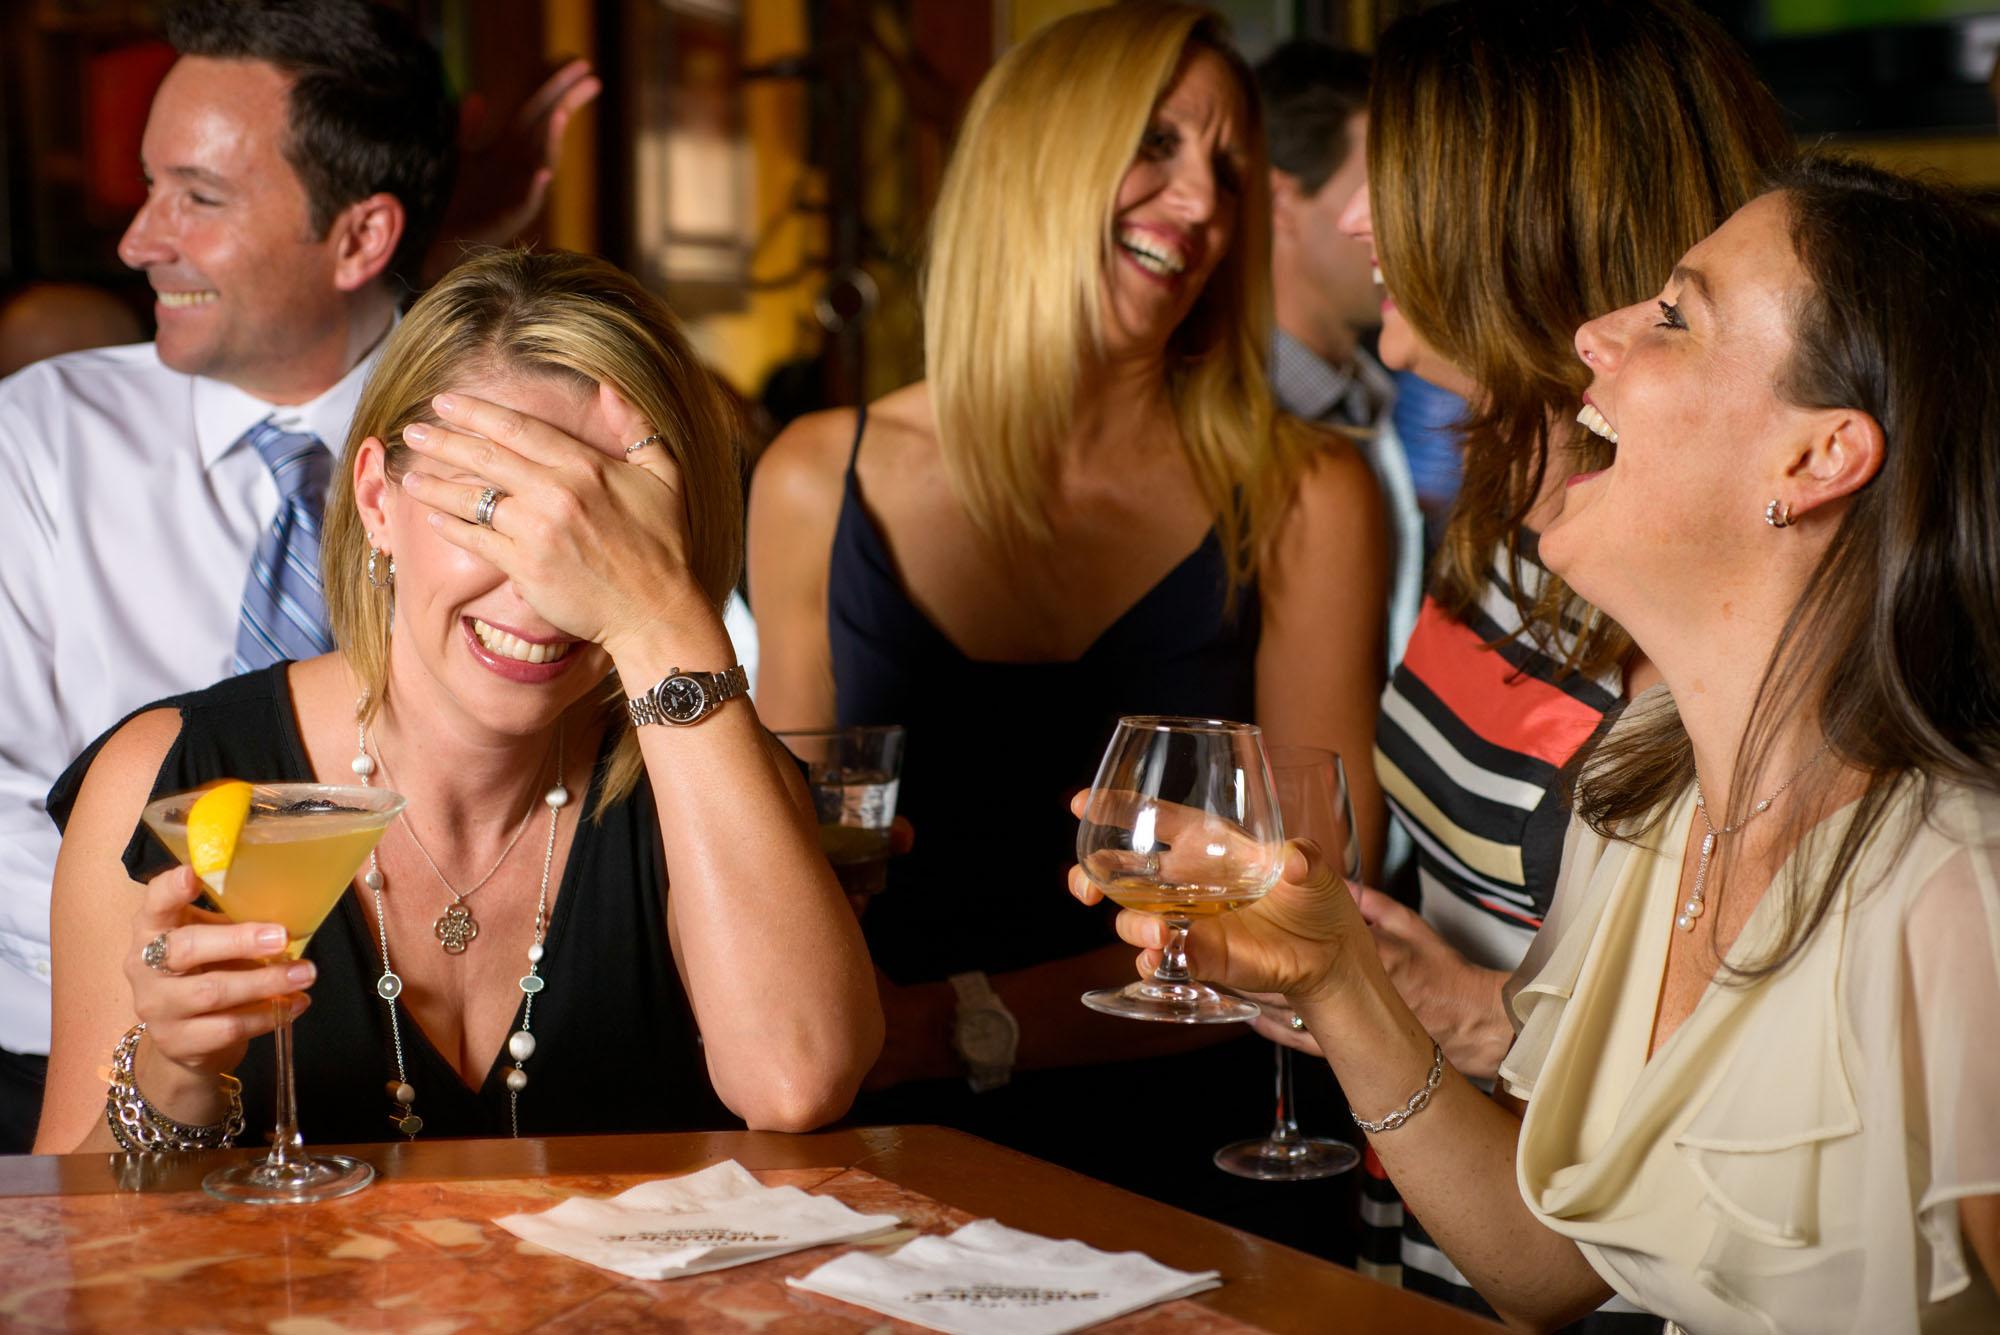 1135_d800b_Sundance_the_Steakhouse_Palo_Alto_Restaurant_Photography.jpg